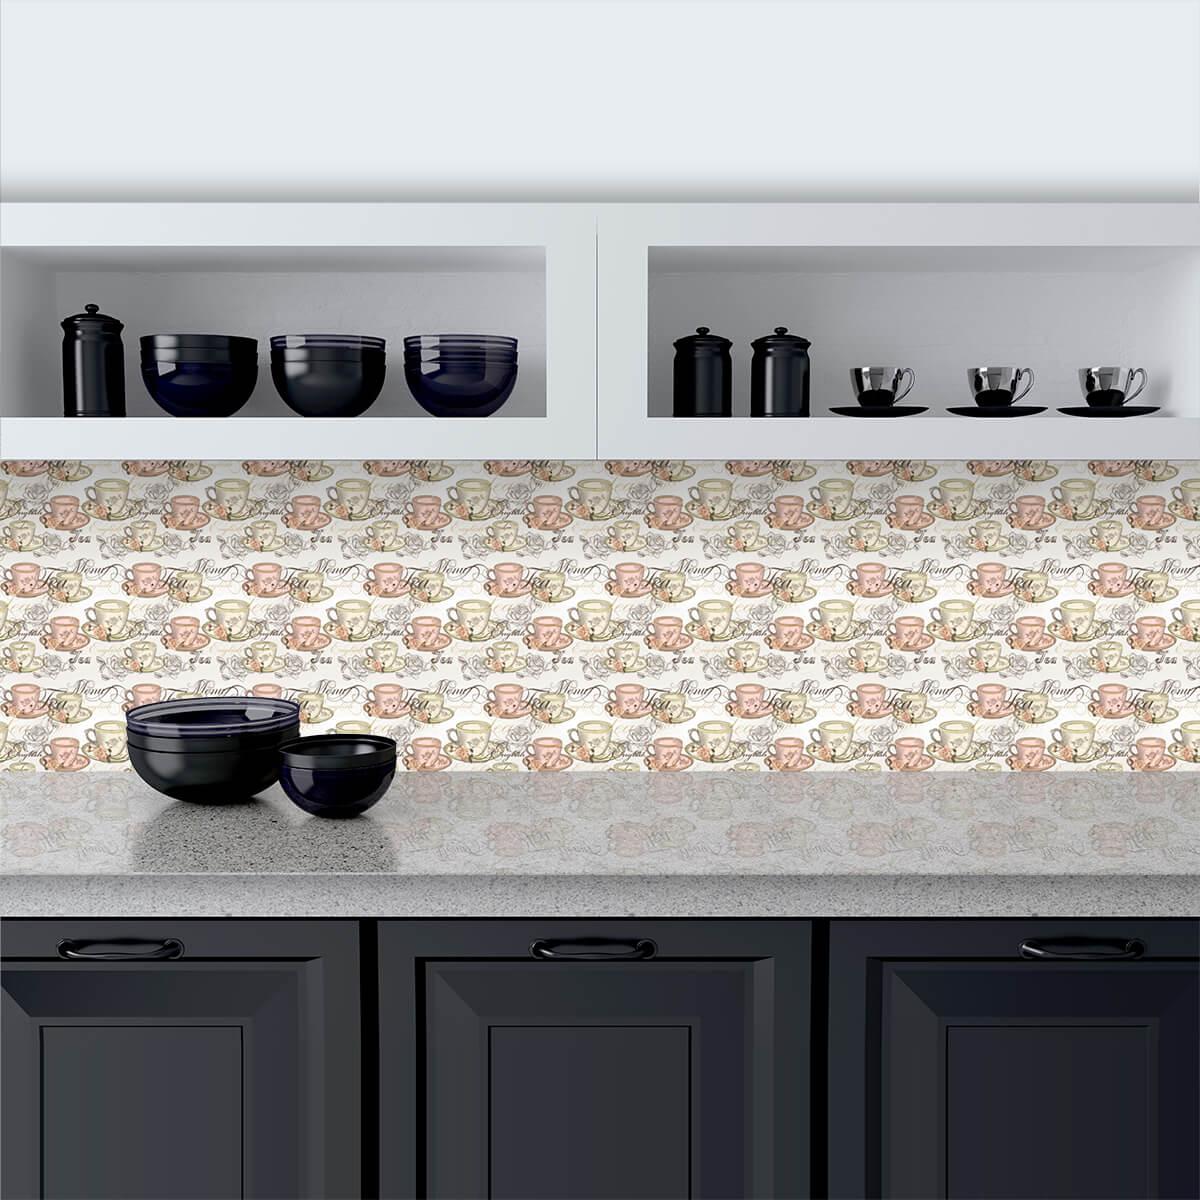 Küchenrückwand aus Glas Tea-Time